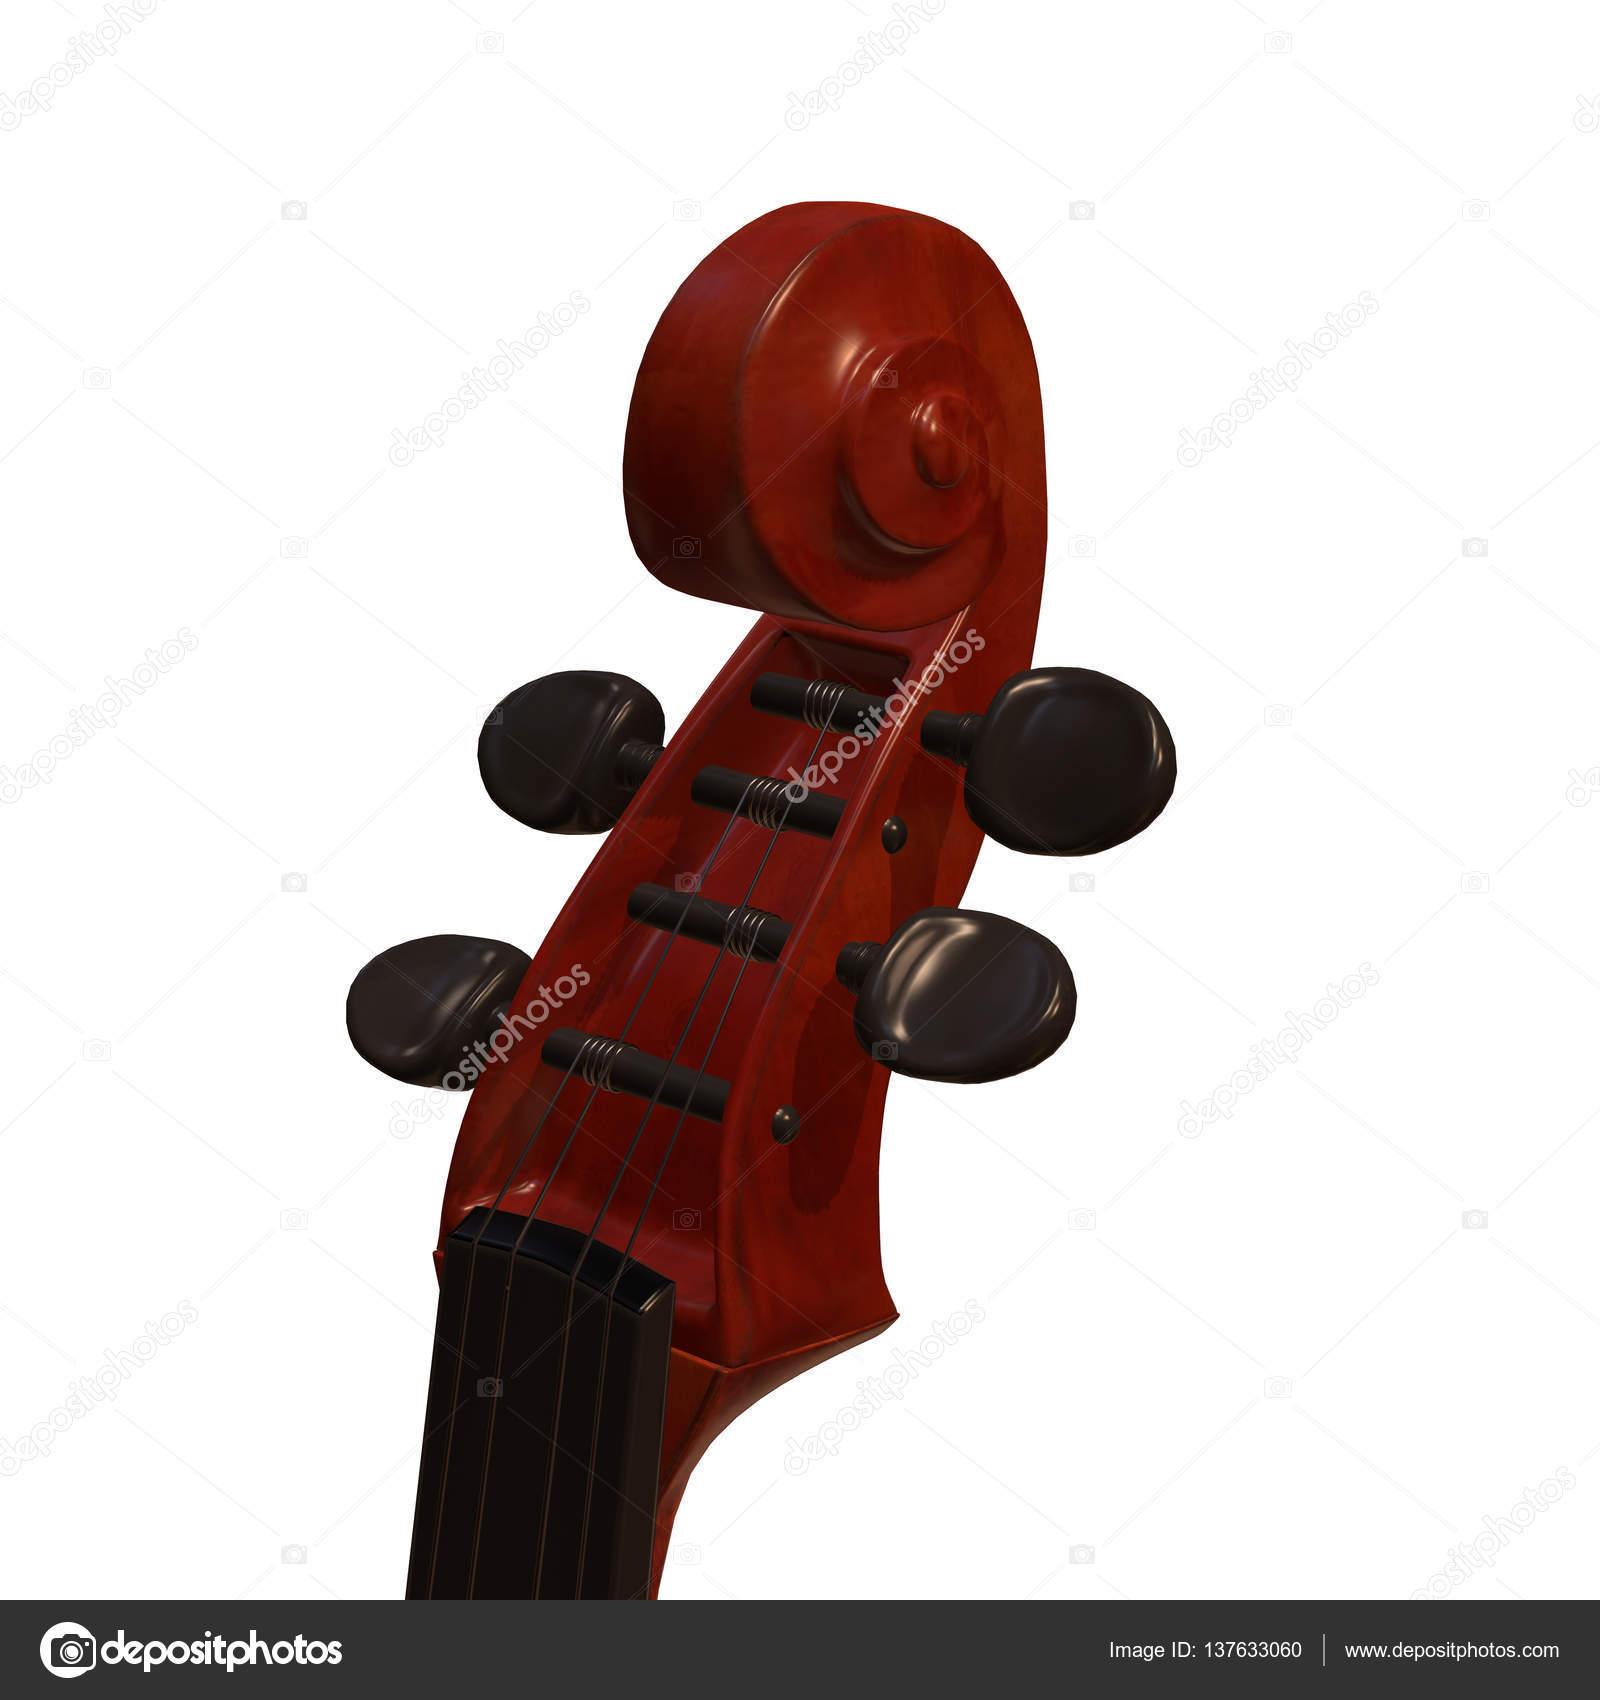 Ilustracion 3d De Violonchelo Instrumento Musical Foto De